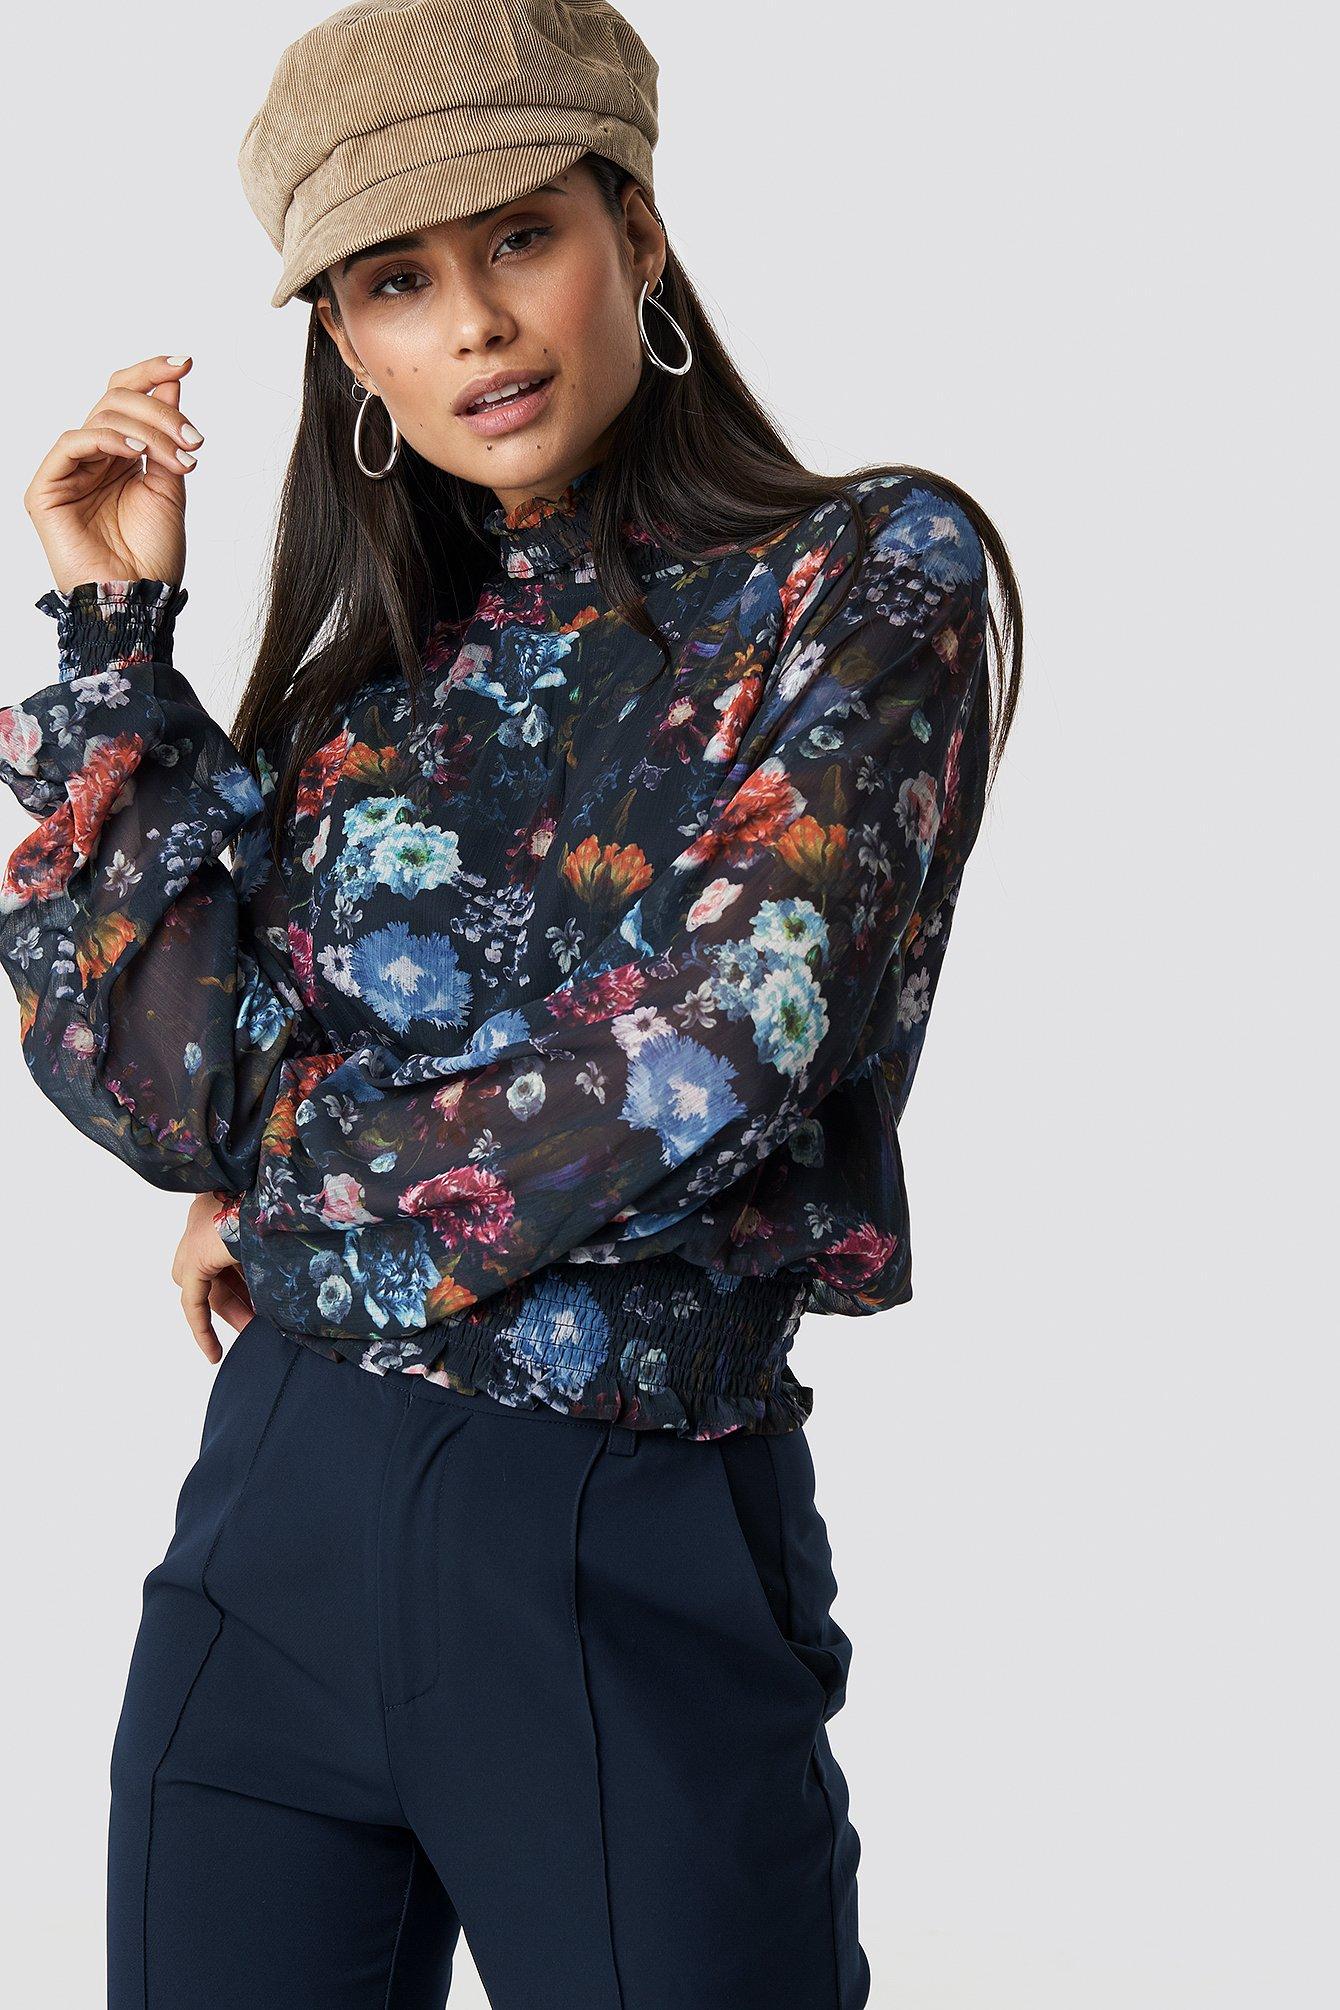 TOP SECRET Flower Long Sleeve Blouse - Multicolor, Navy in Multicolor,Navy